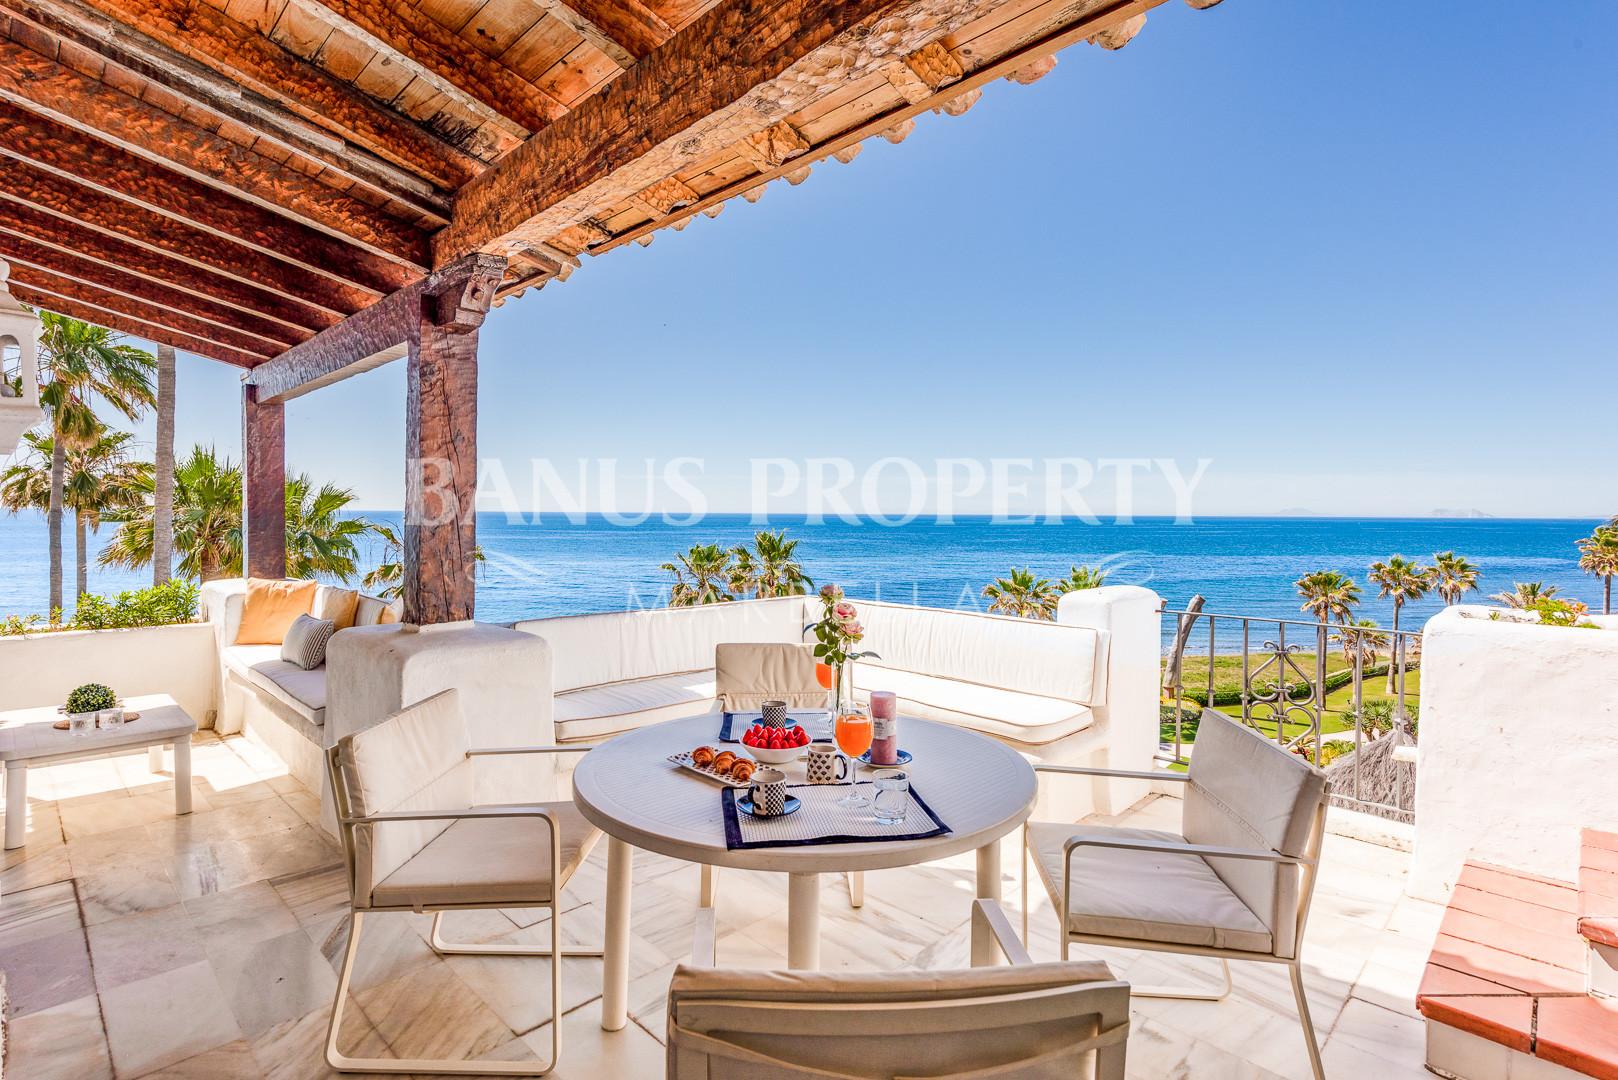 3 Bed Penthouse in The Frontline Beach complex Alcazaba Beach- Estepona